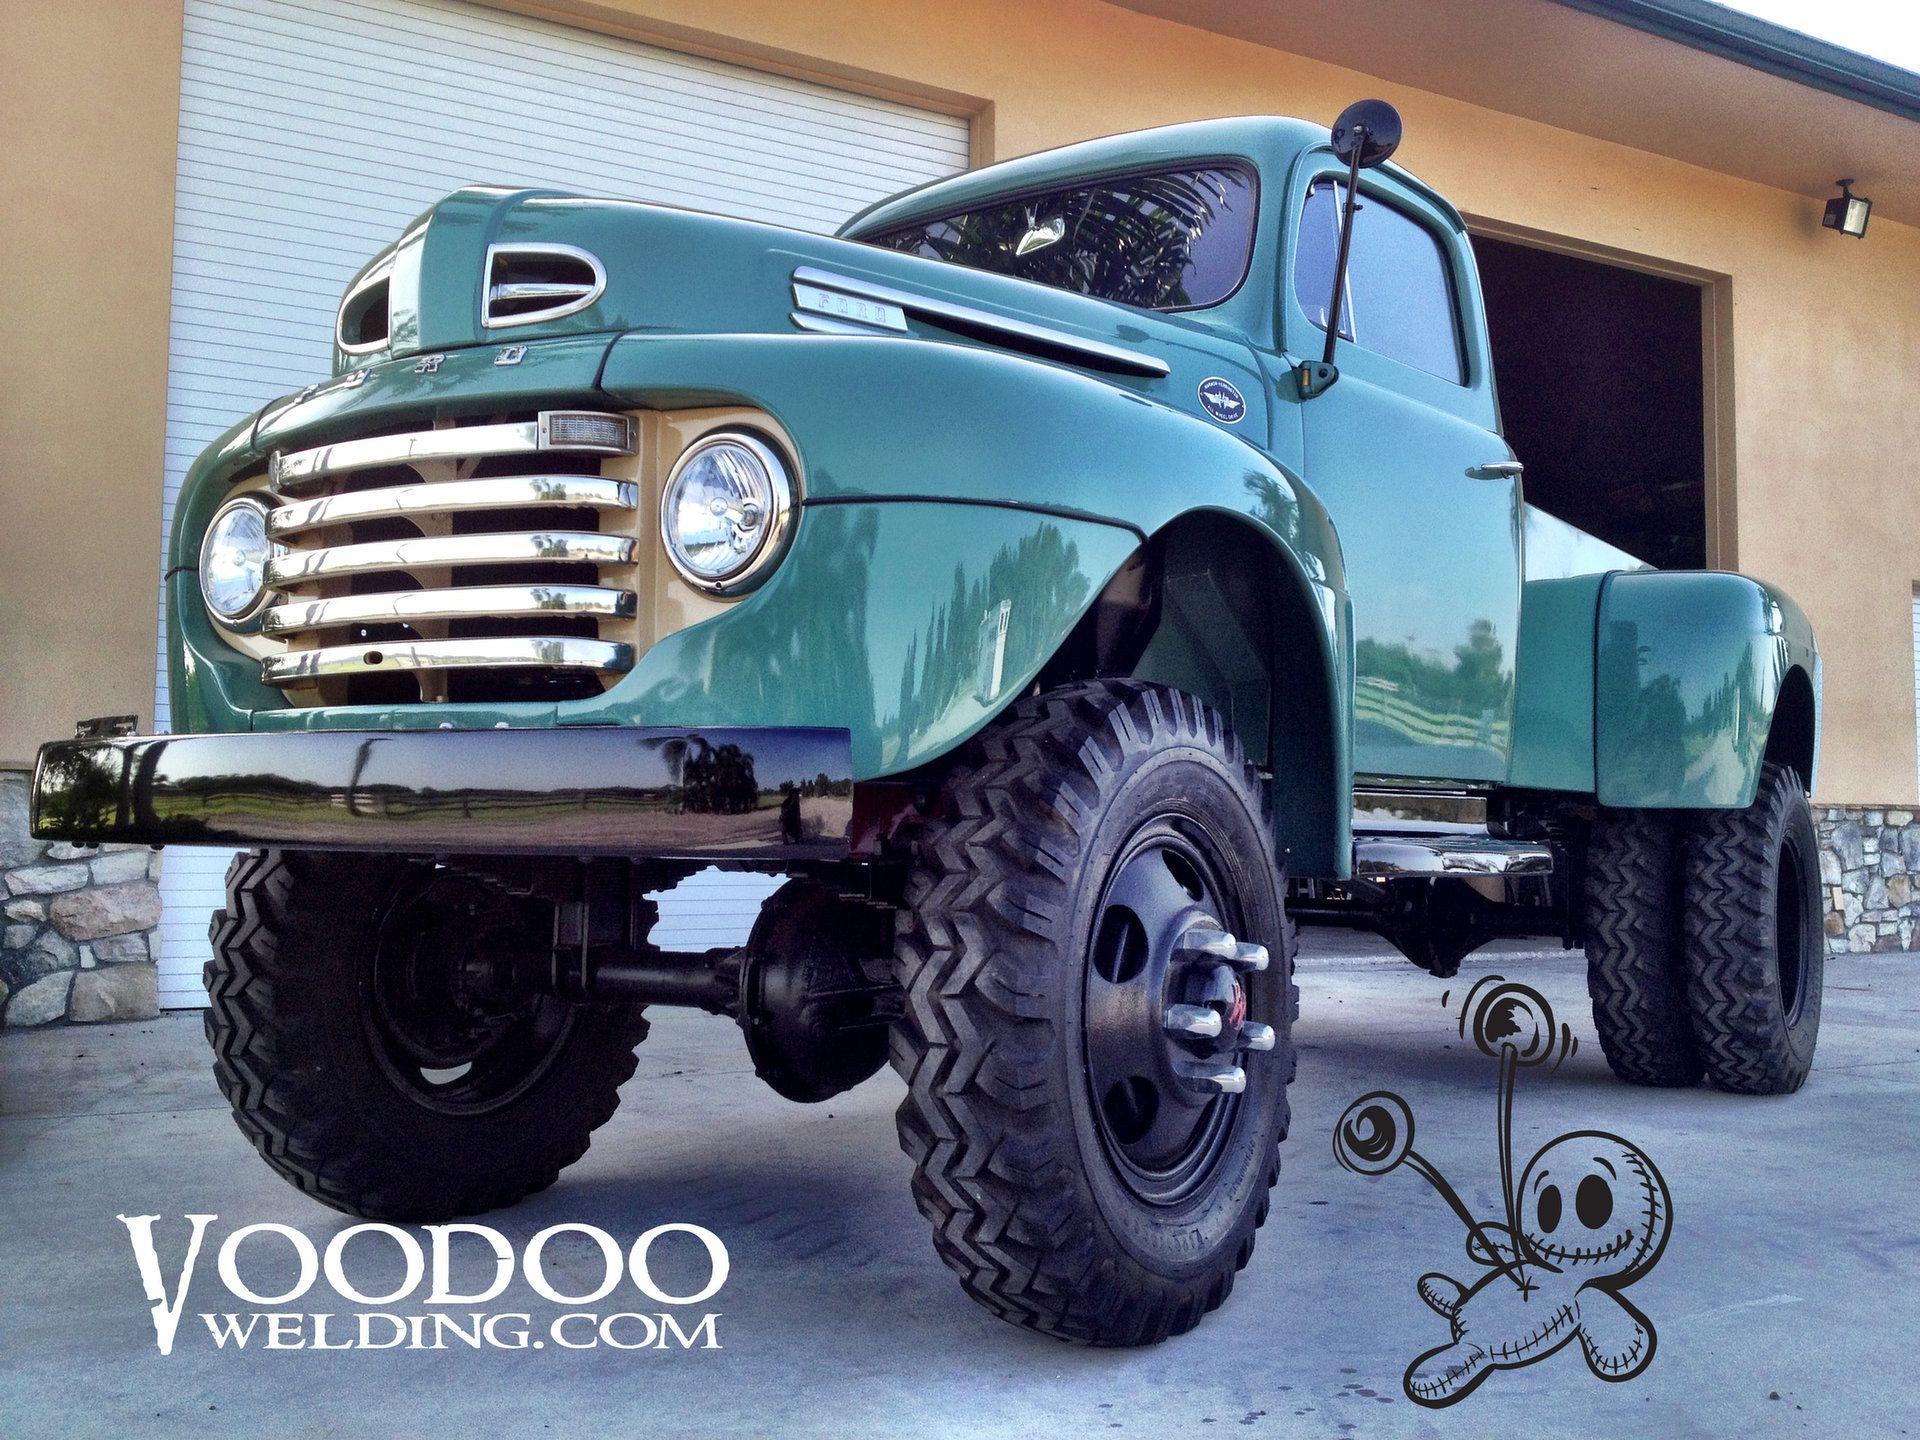 Voodoo Welding Speed And Custom 1948 Ford F 6 Marmon Herrington Trucks Ford Trucks Classic Cars Trucks